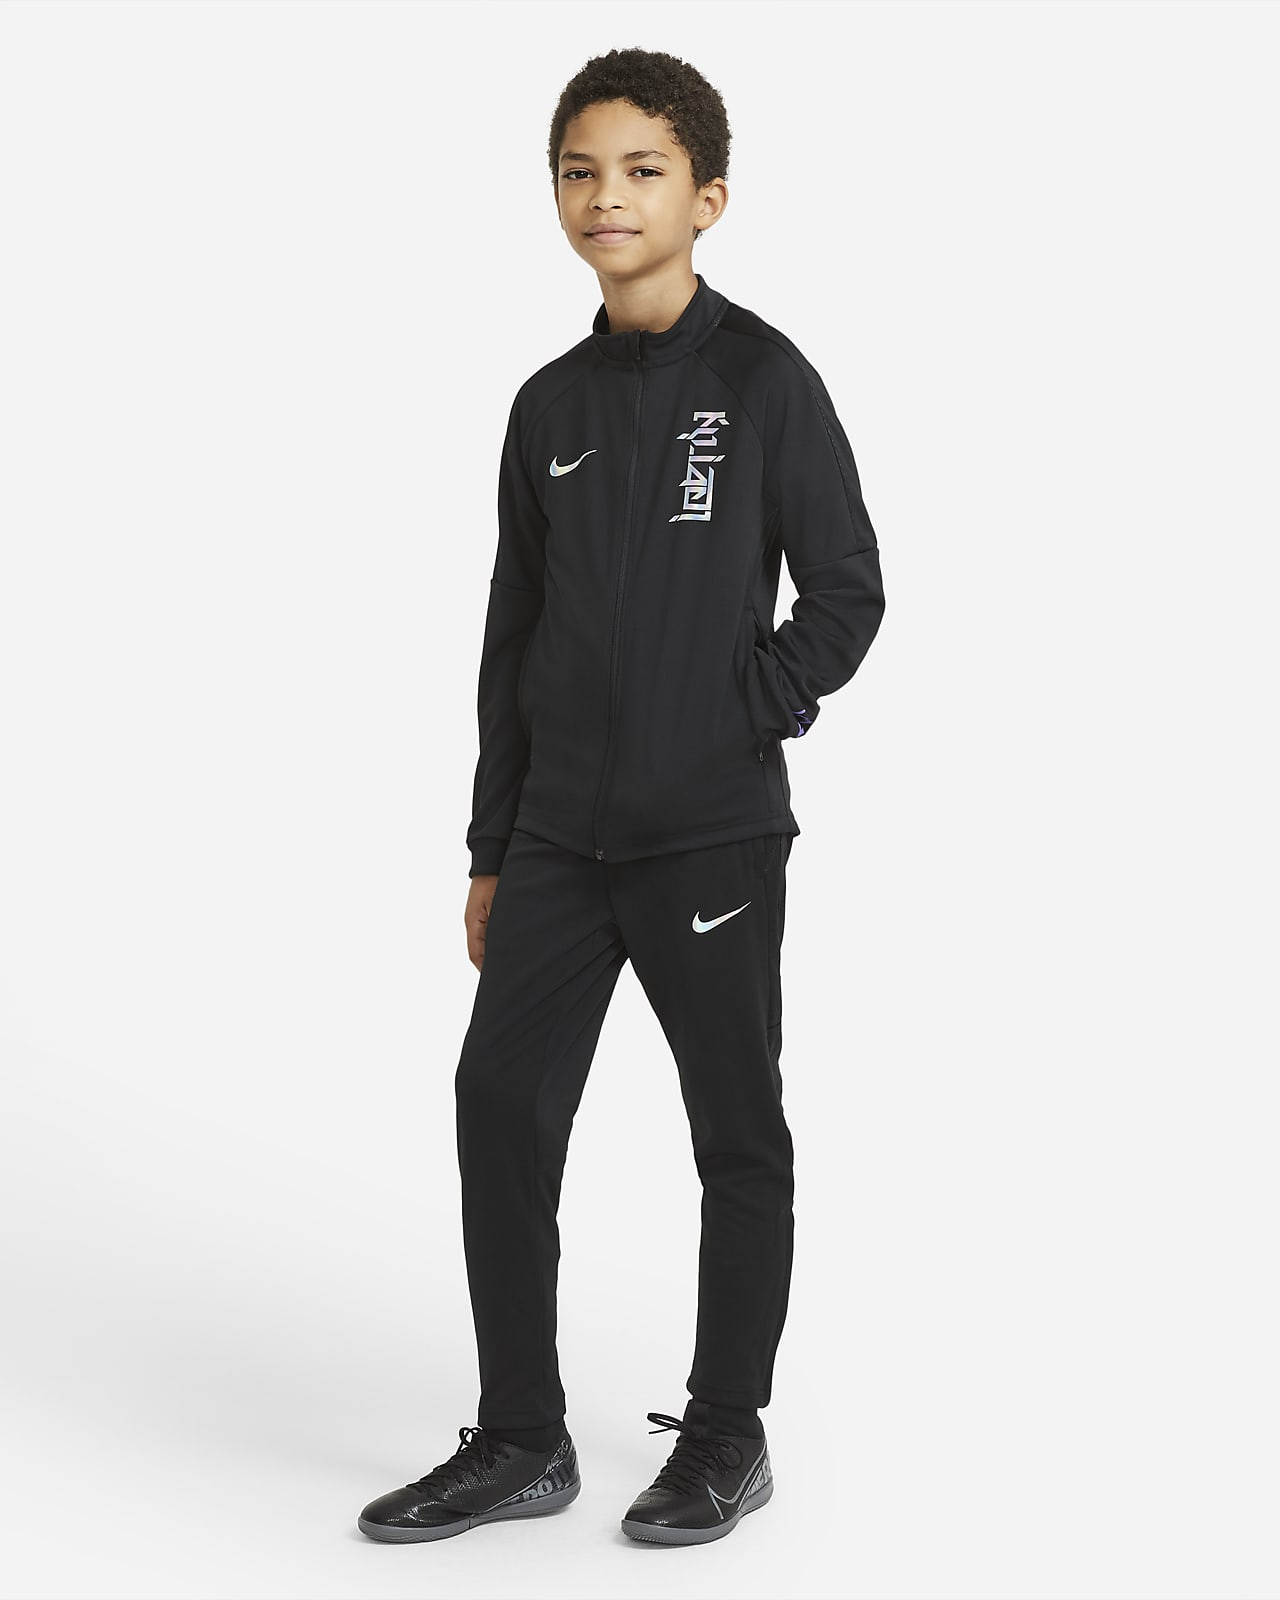 Nike Dri-FIT Kylian Mbappé Older Kids' Knit Football Tracksuit